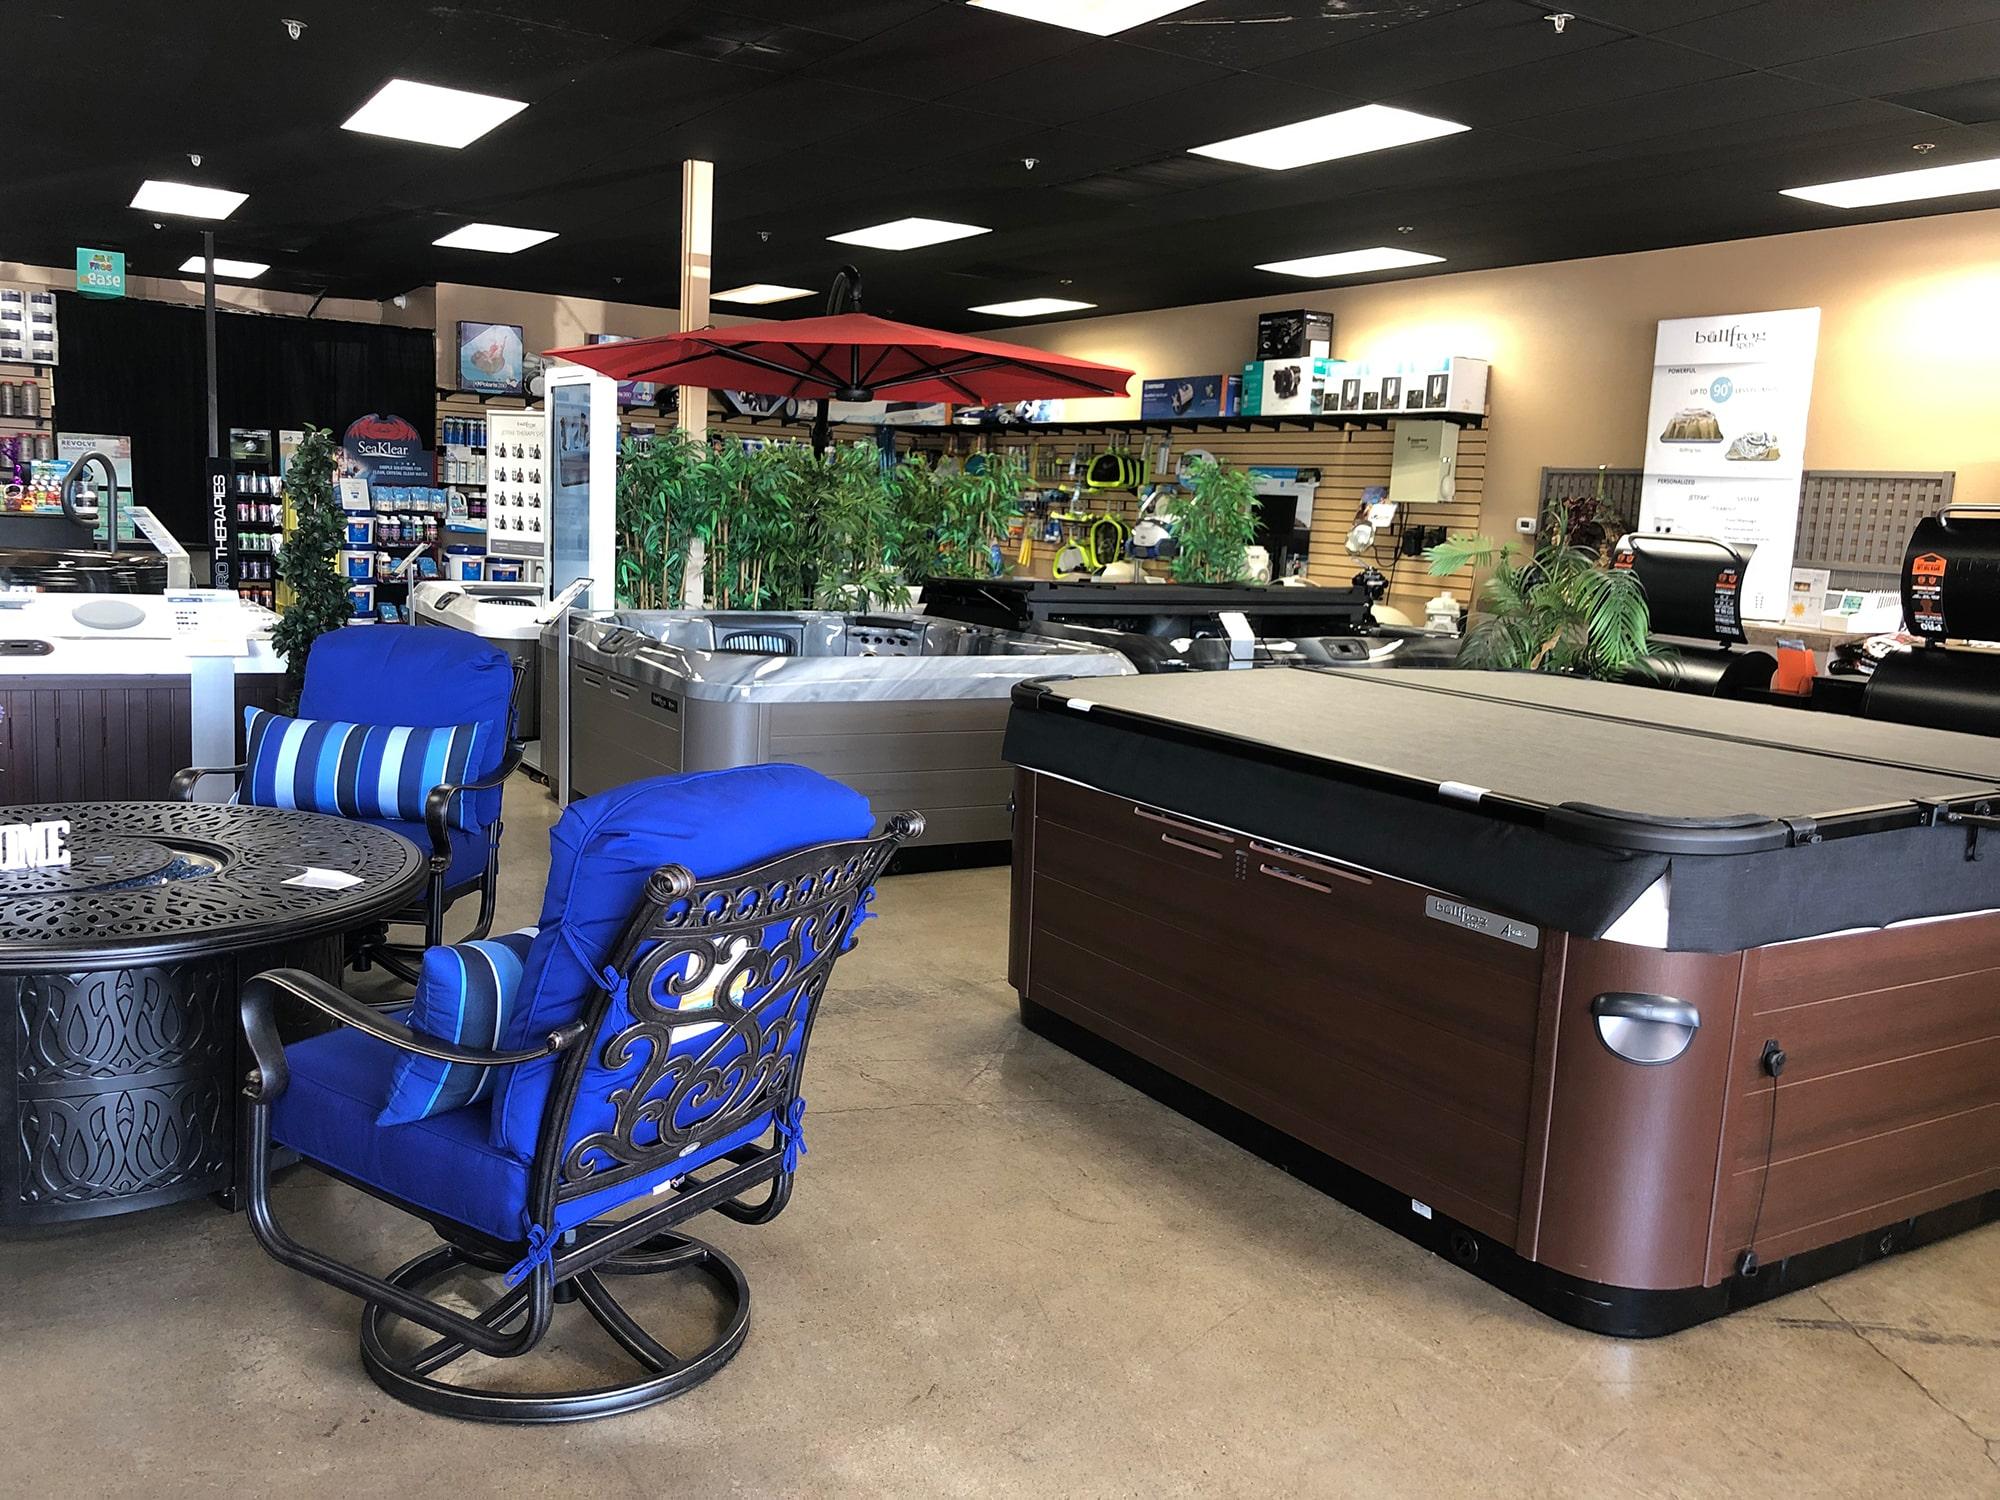 Backyard Spa Leisure Showroom in Fresno, CA